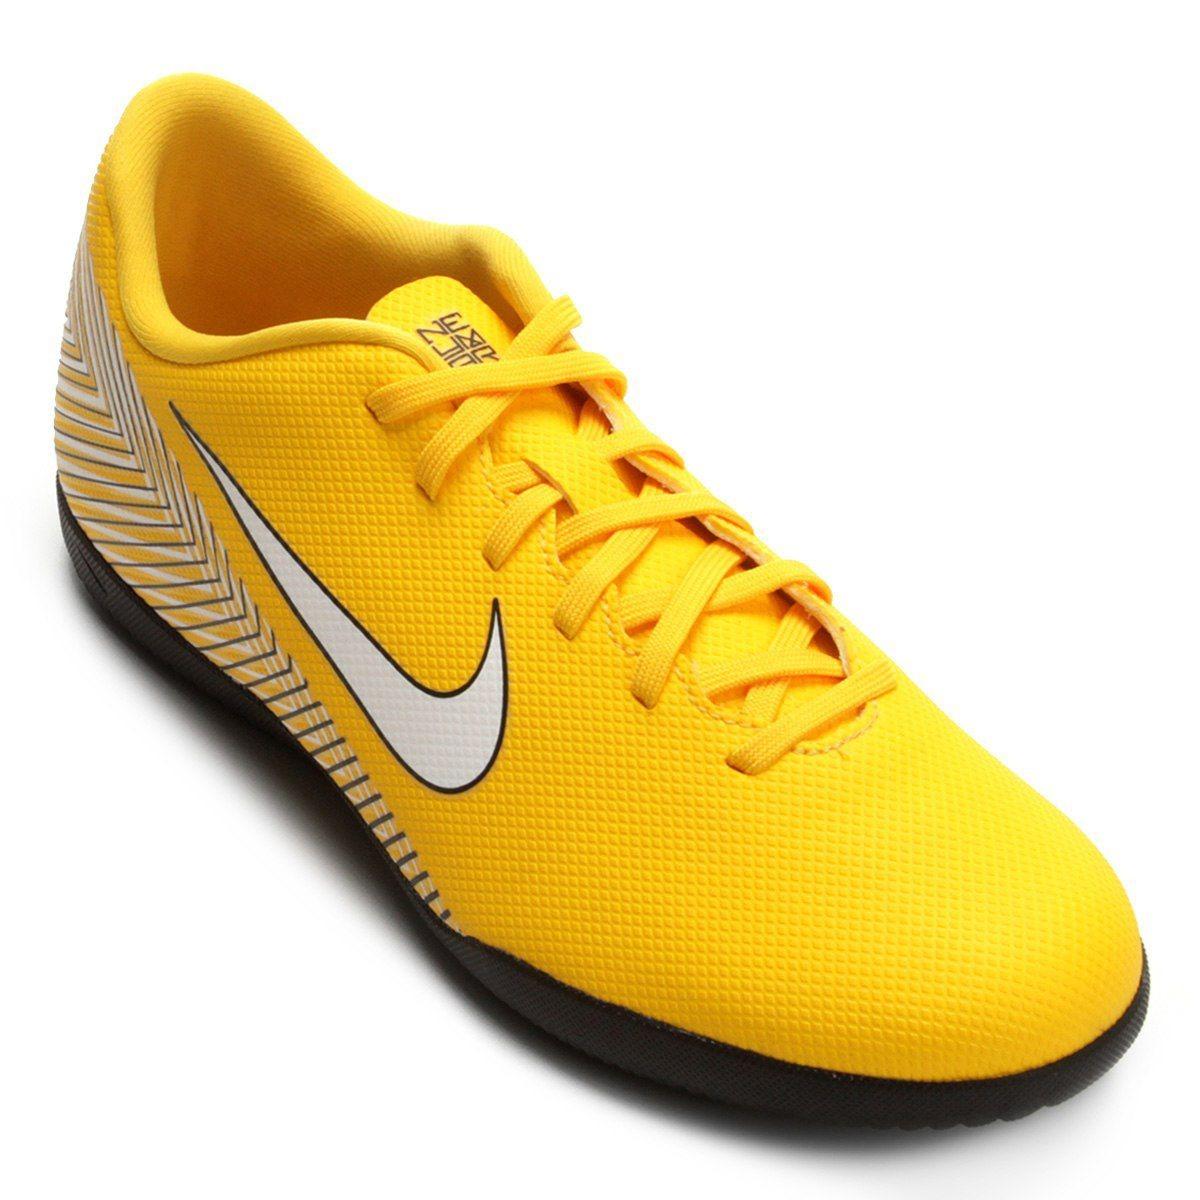 2c0b52df0f chuteira futsal nike mercurial vapor x 12 club njr - amarela. Carregando  zoom.